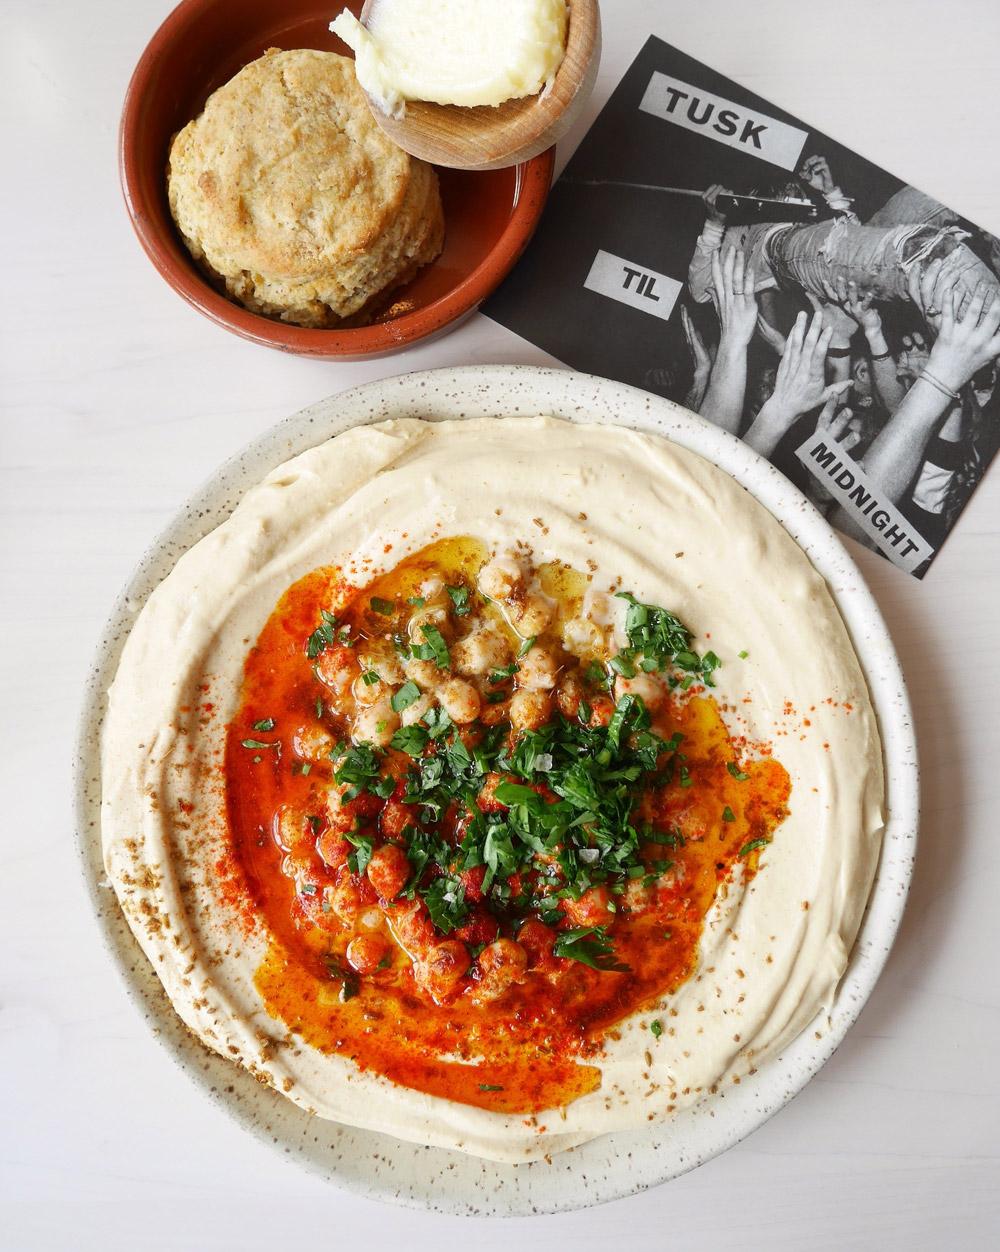 Hummus, Zaatar Biscuits, Tusk, SE Portland